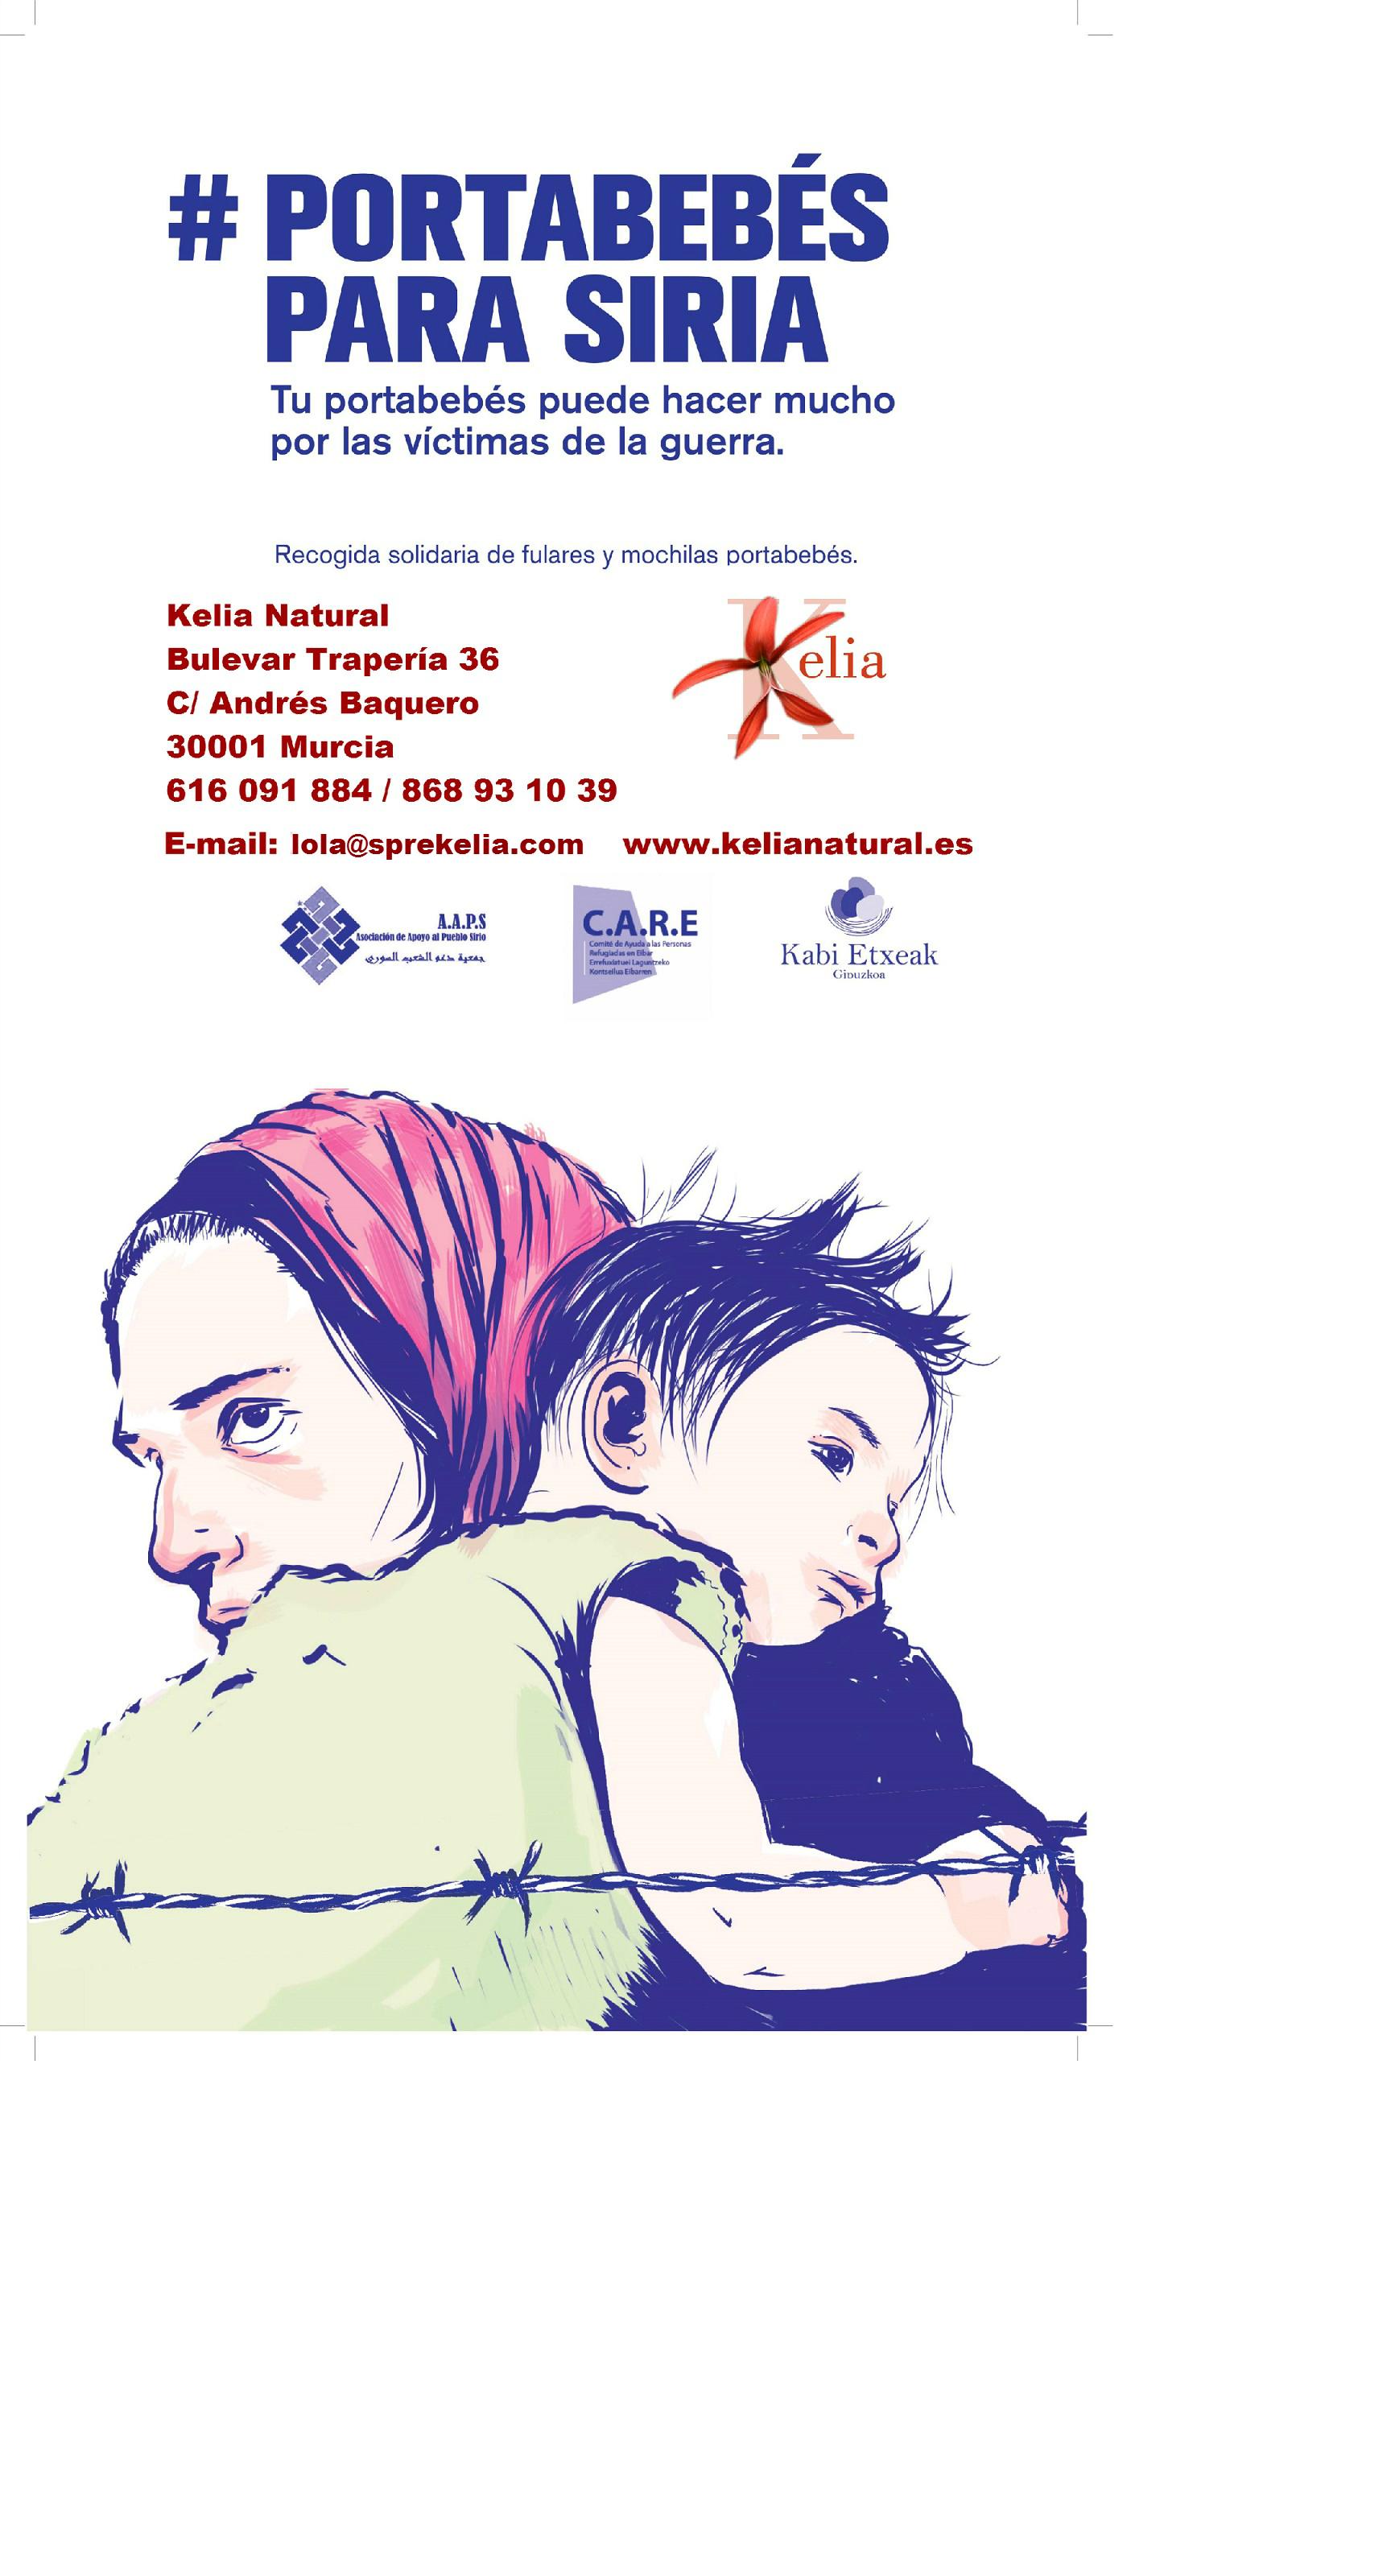 portabebés siria kelia